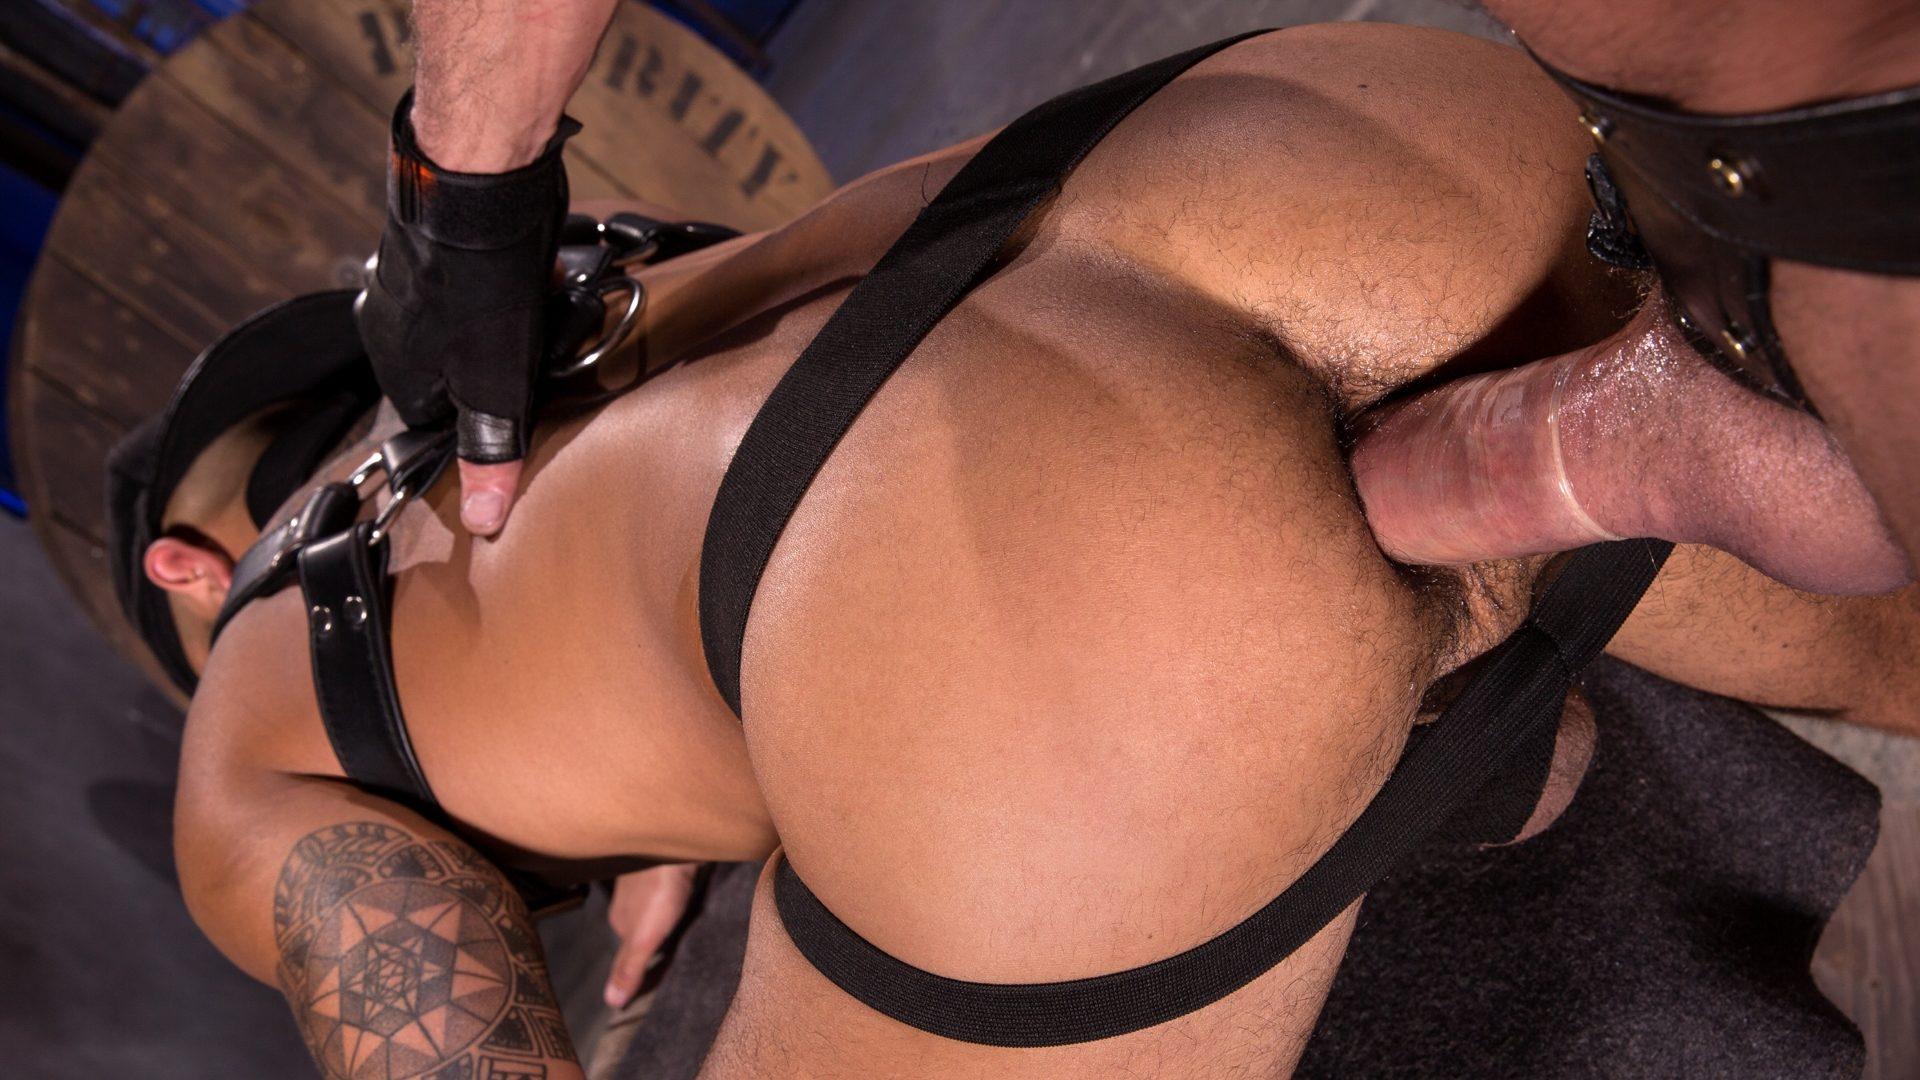 Leather Men: Myles Landon and Talon Reed – Part 2